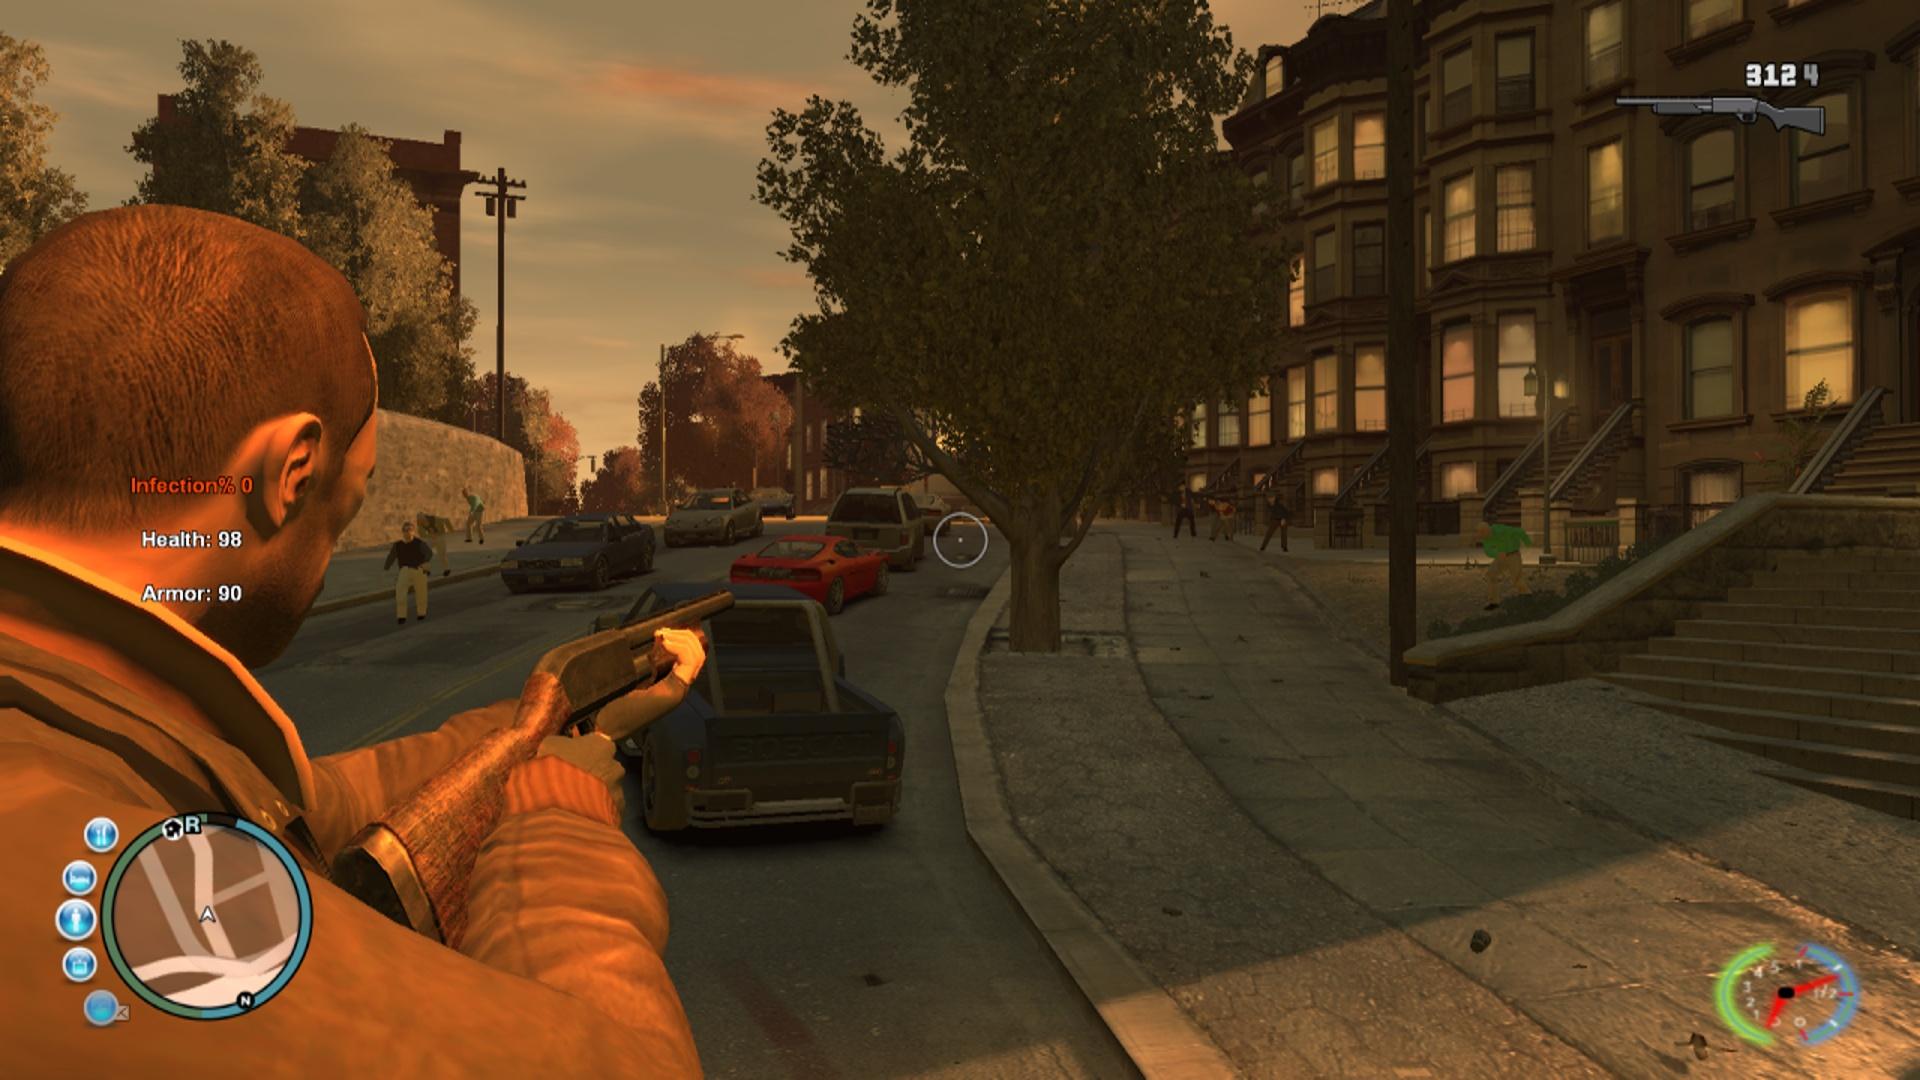 The GTA Place - Grand Theft Auto ZombieLand 1 0 / Zombie survival